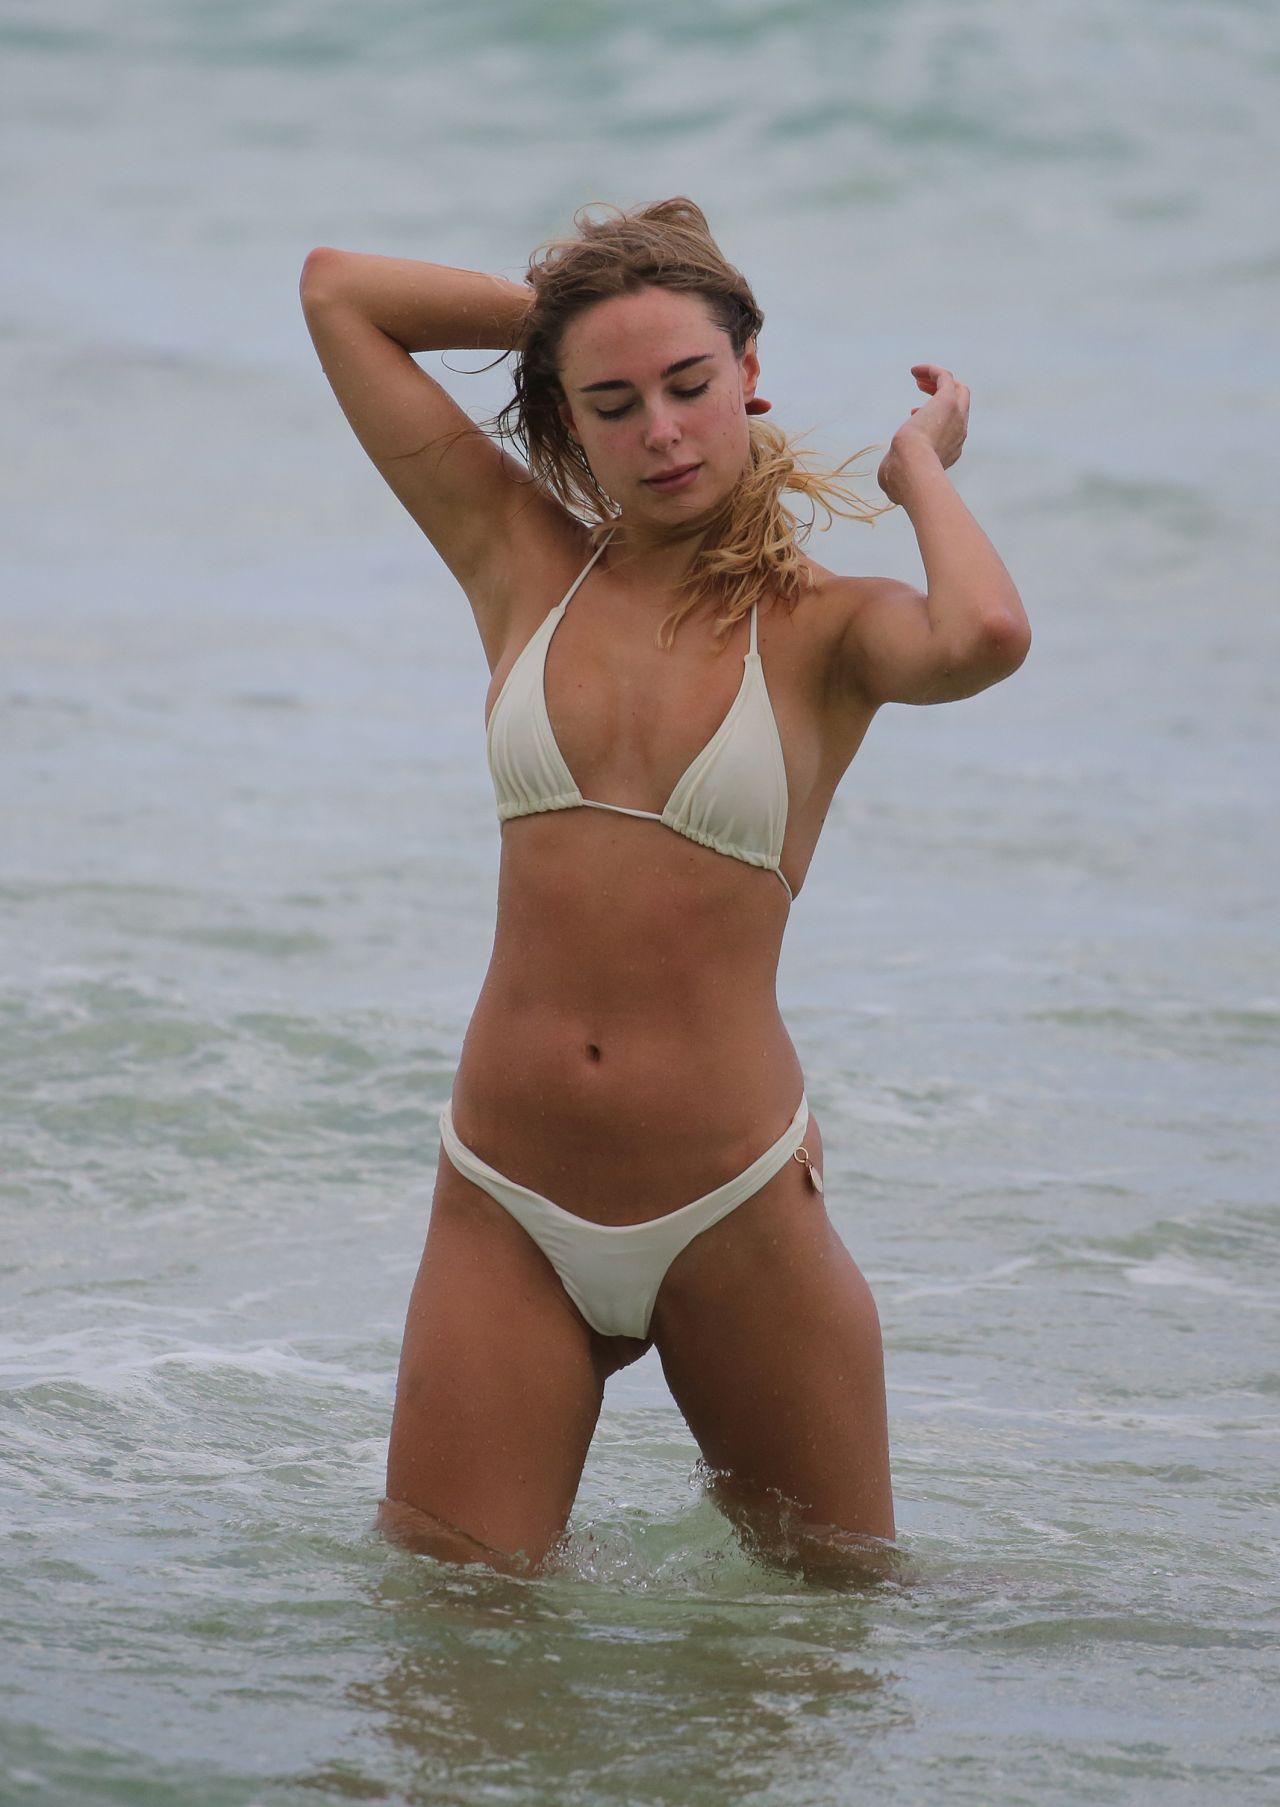 commit error. suggest brazilian women bikini girls recommend you